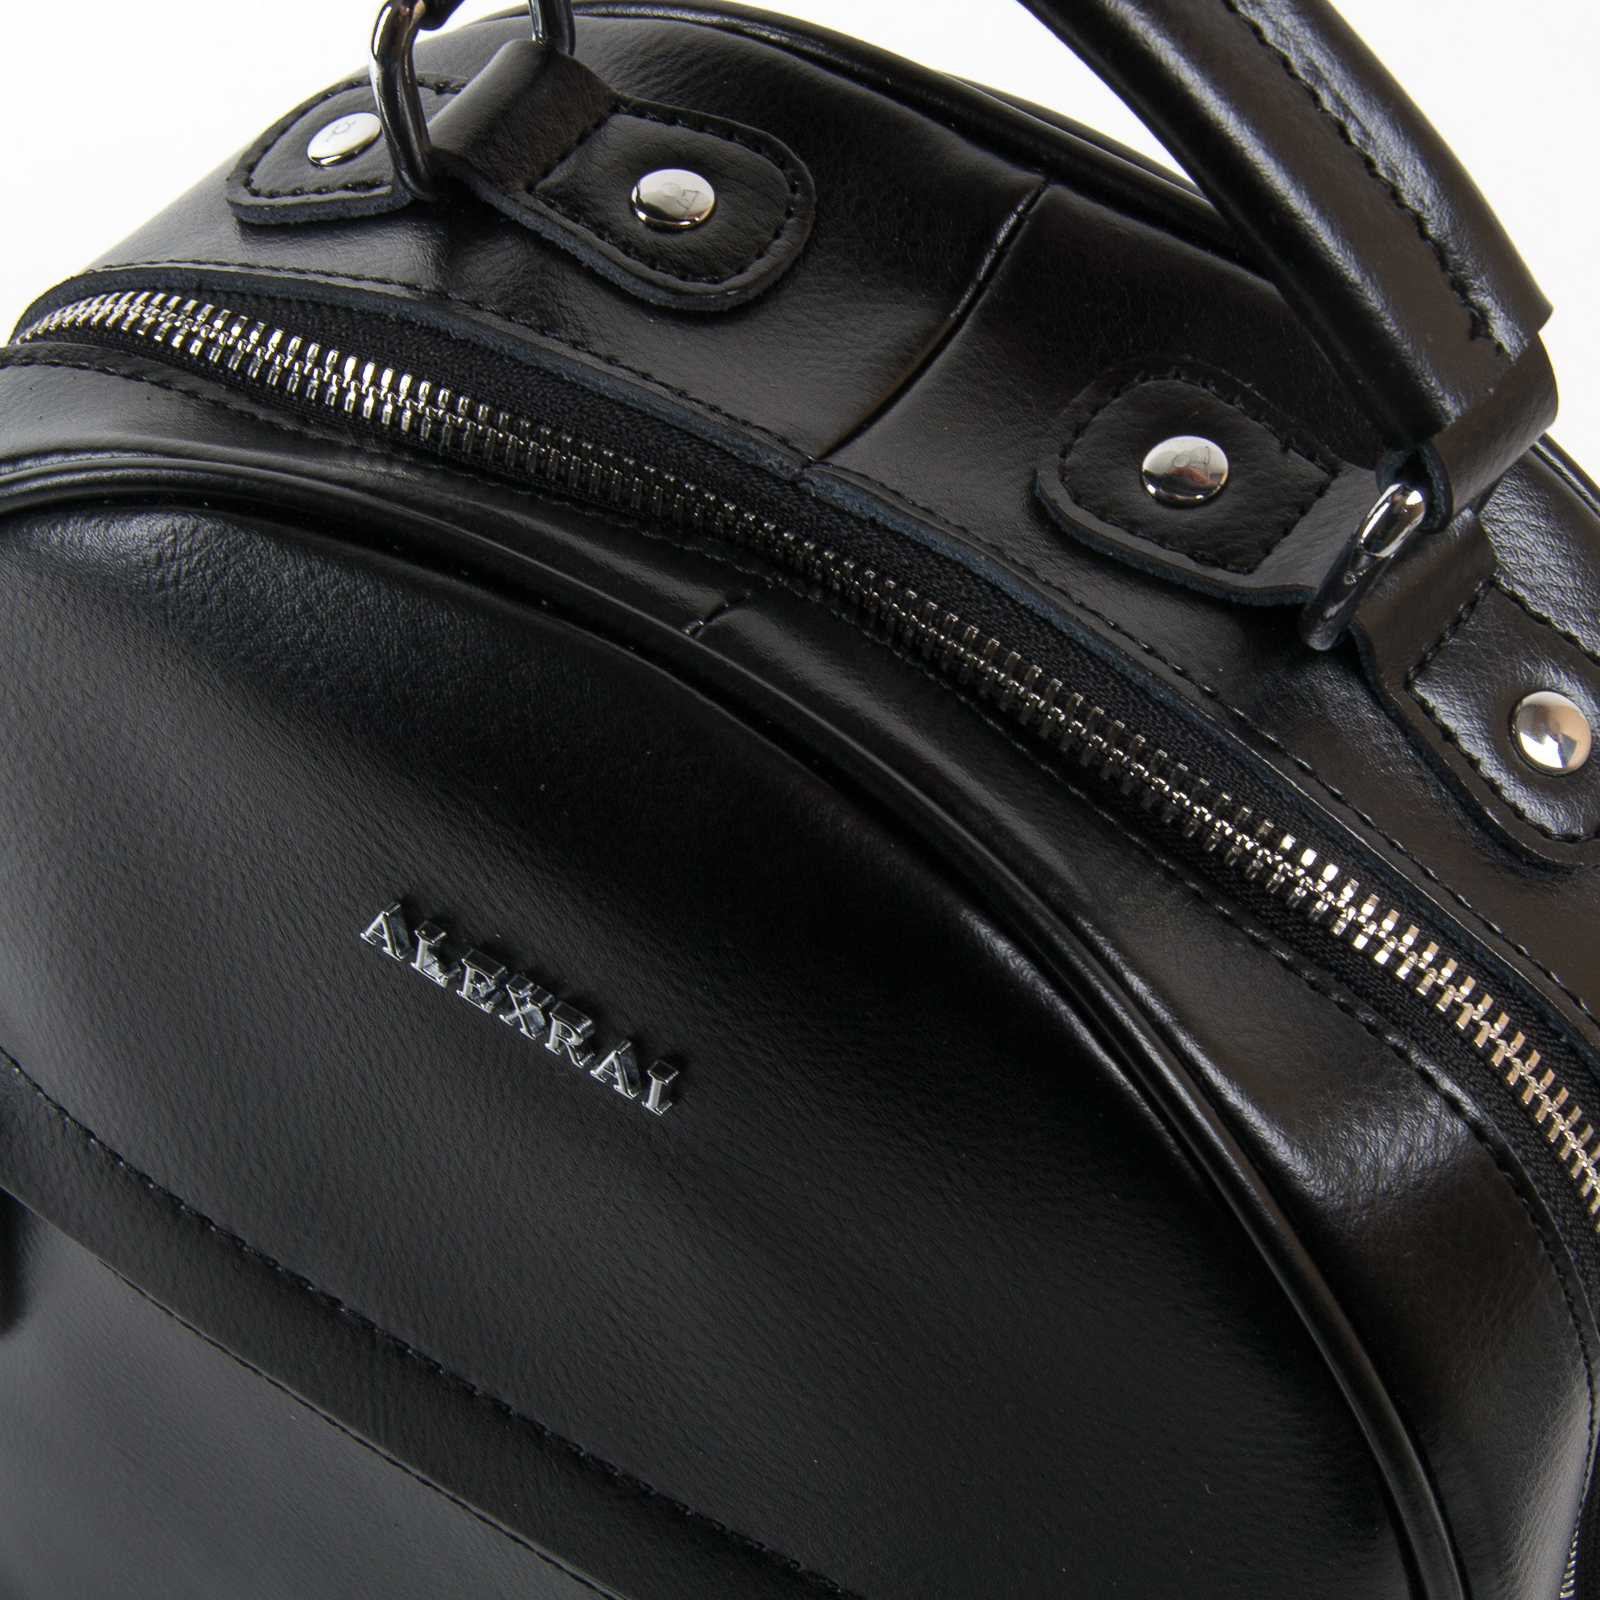 Сумка Женская Рюкзак кожа ALEX RAI 03-01 8715 black - фото 3